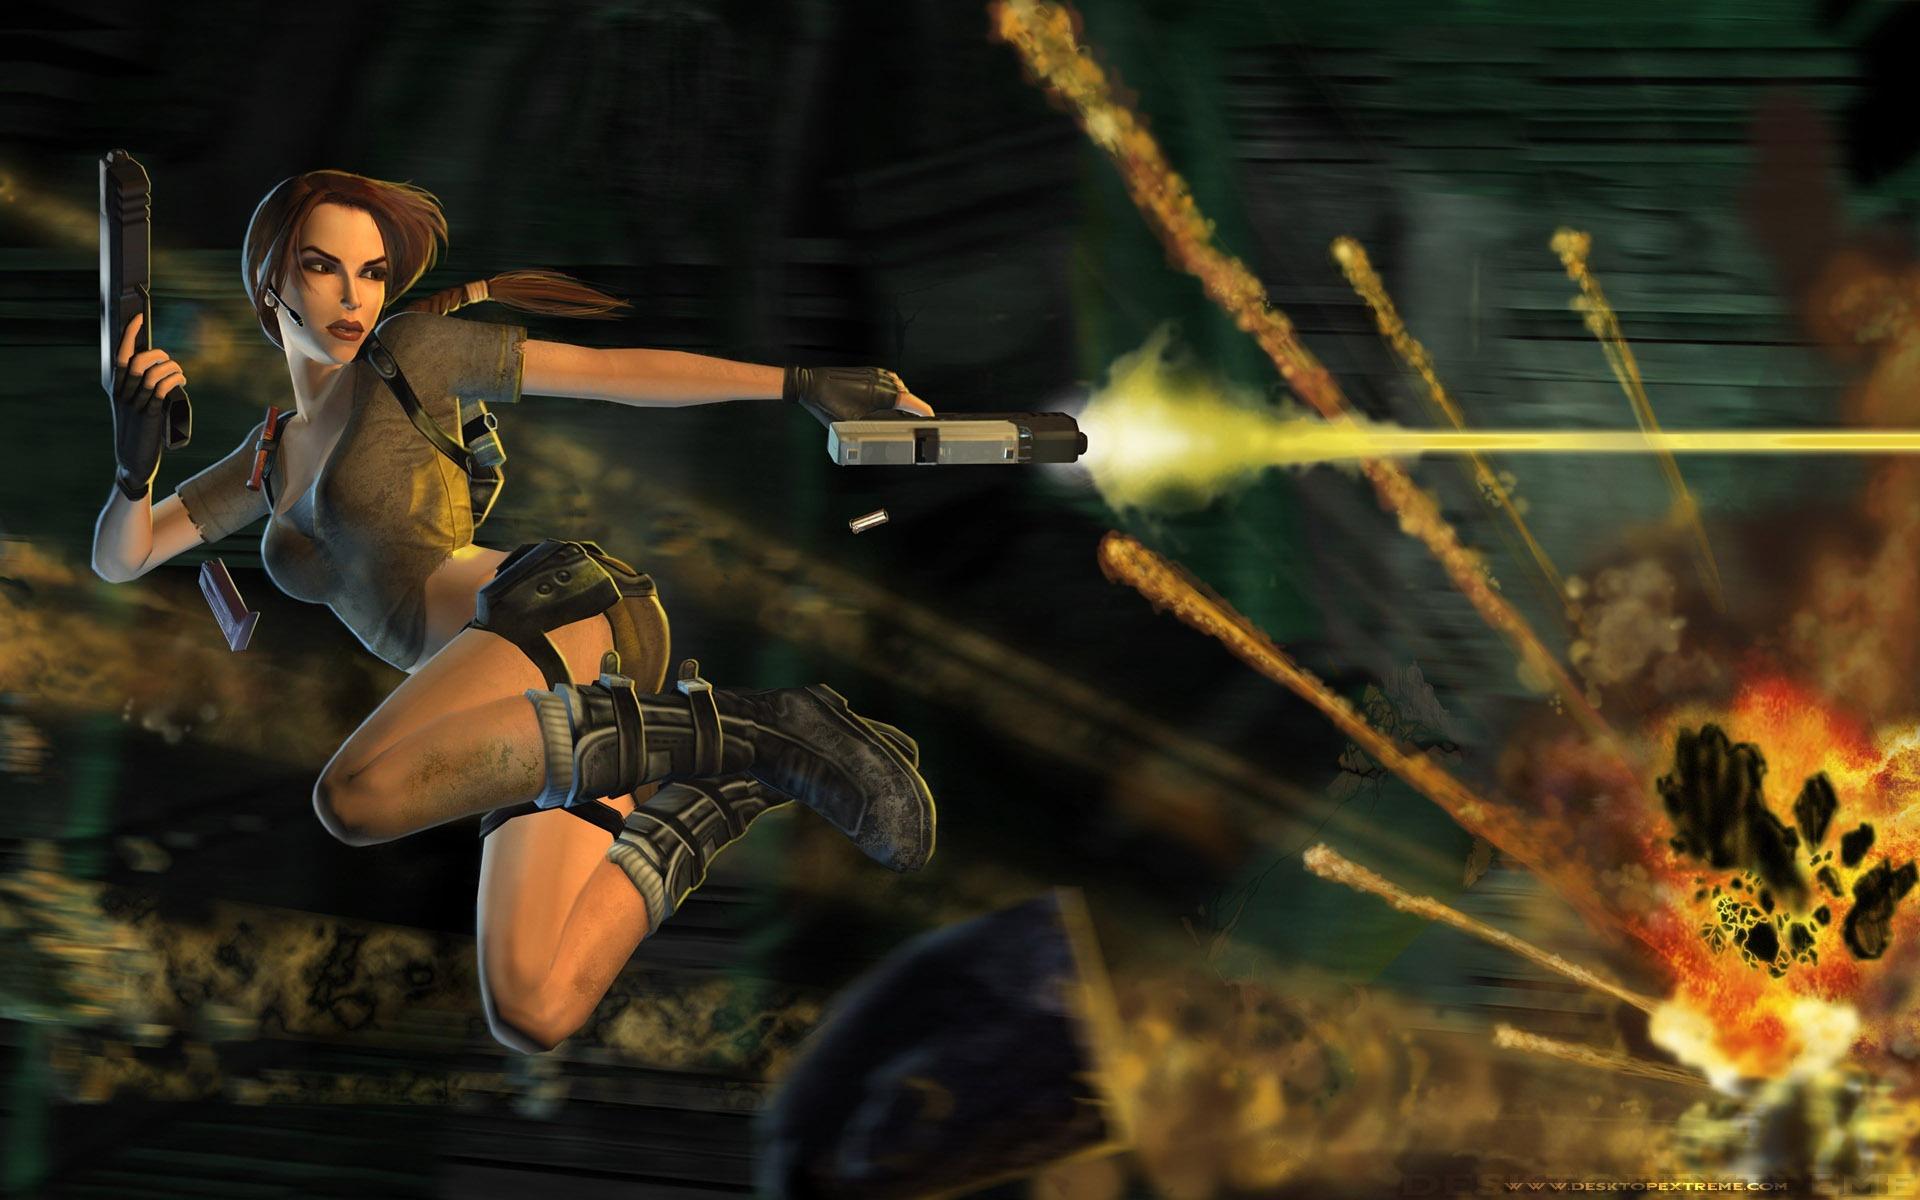 Tomb Raider 2012 Game HD Wallpaper 04 - 1920x1200 wallpaper downloadTomb Raider 2 Wallpaper